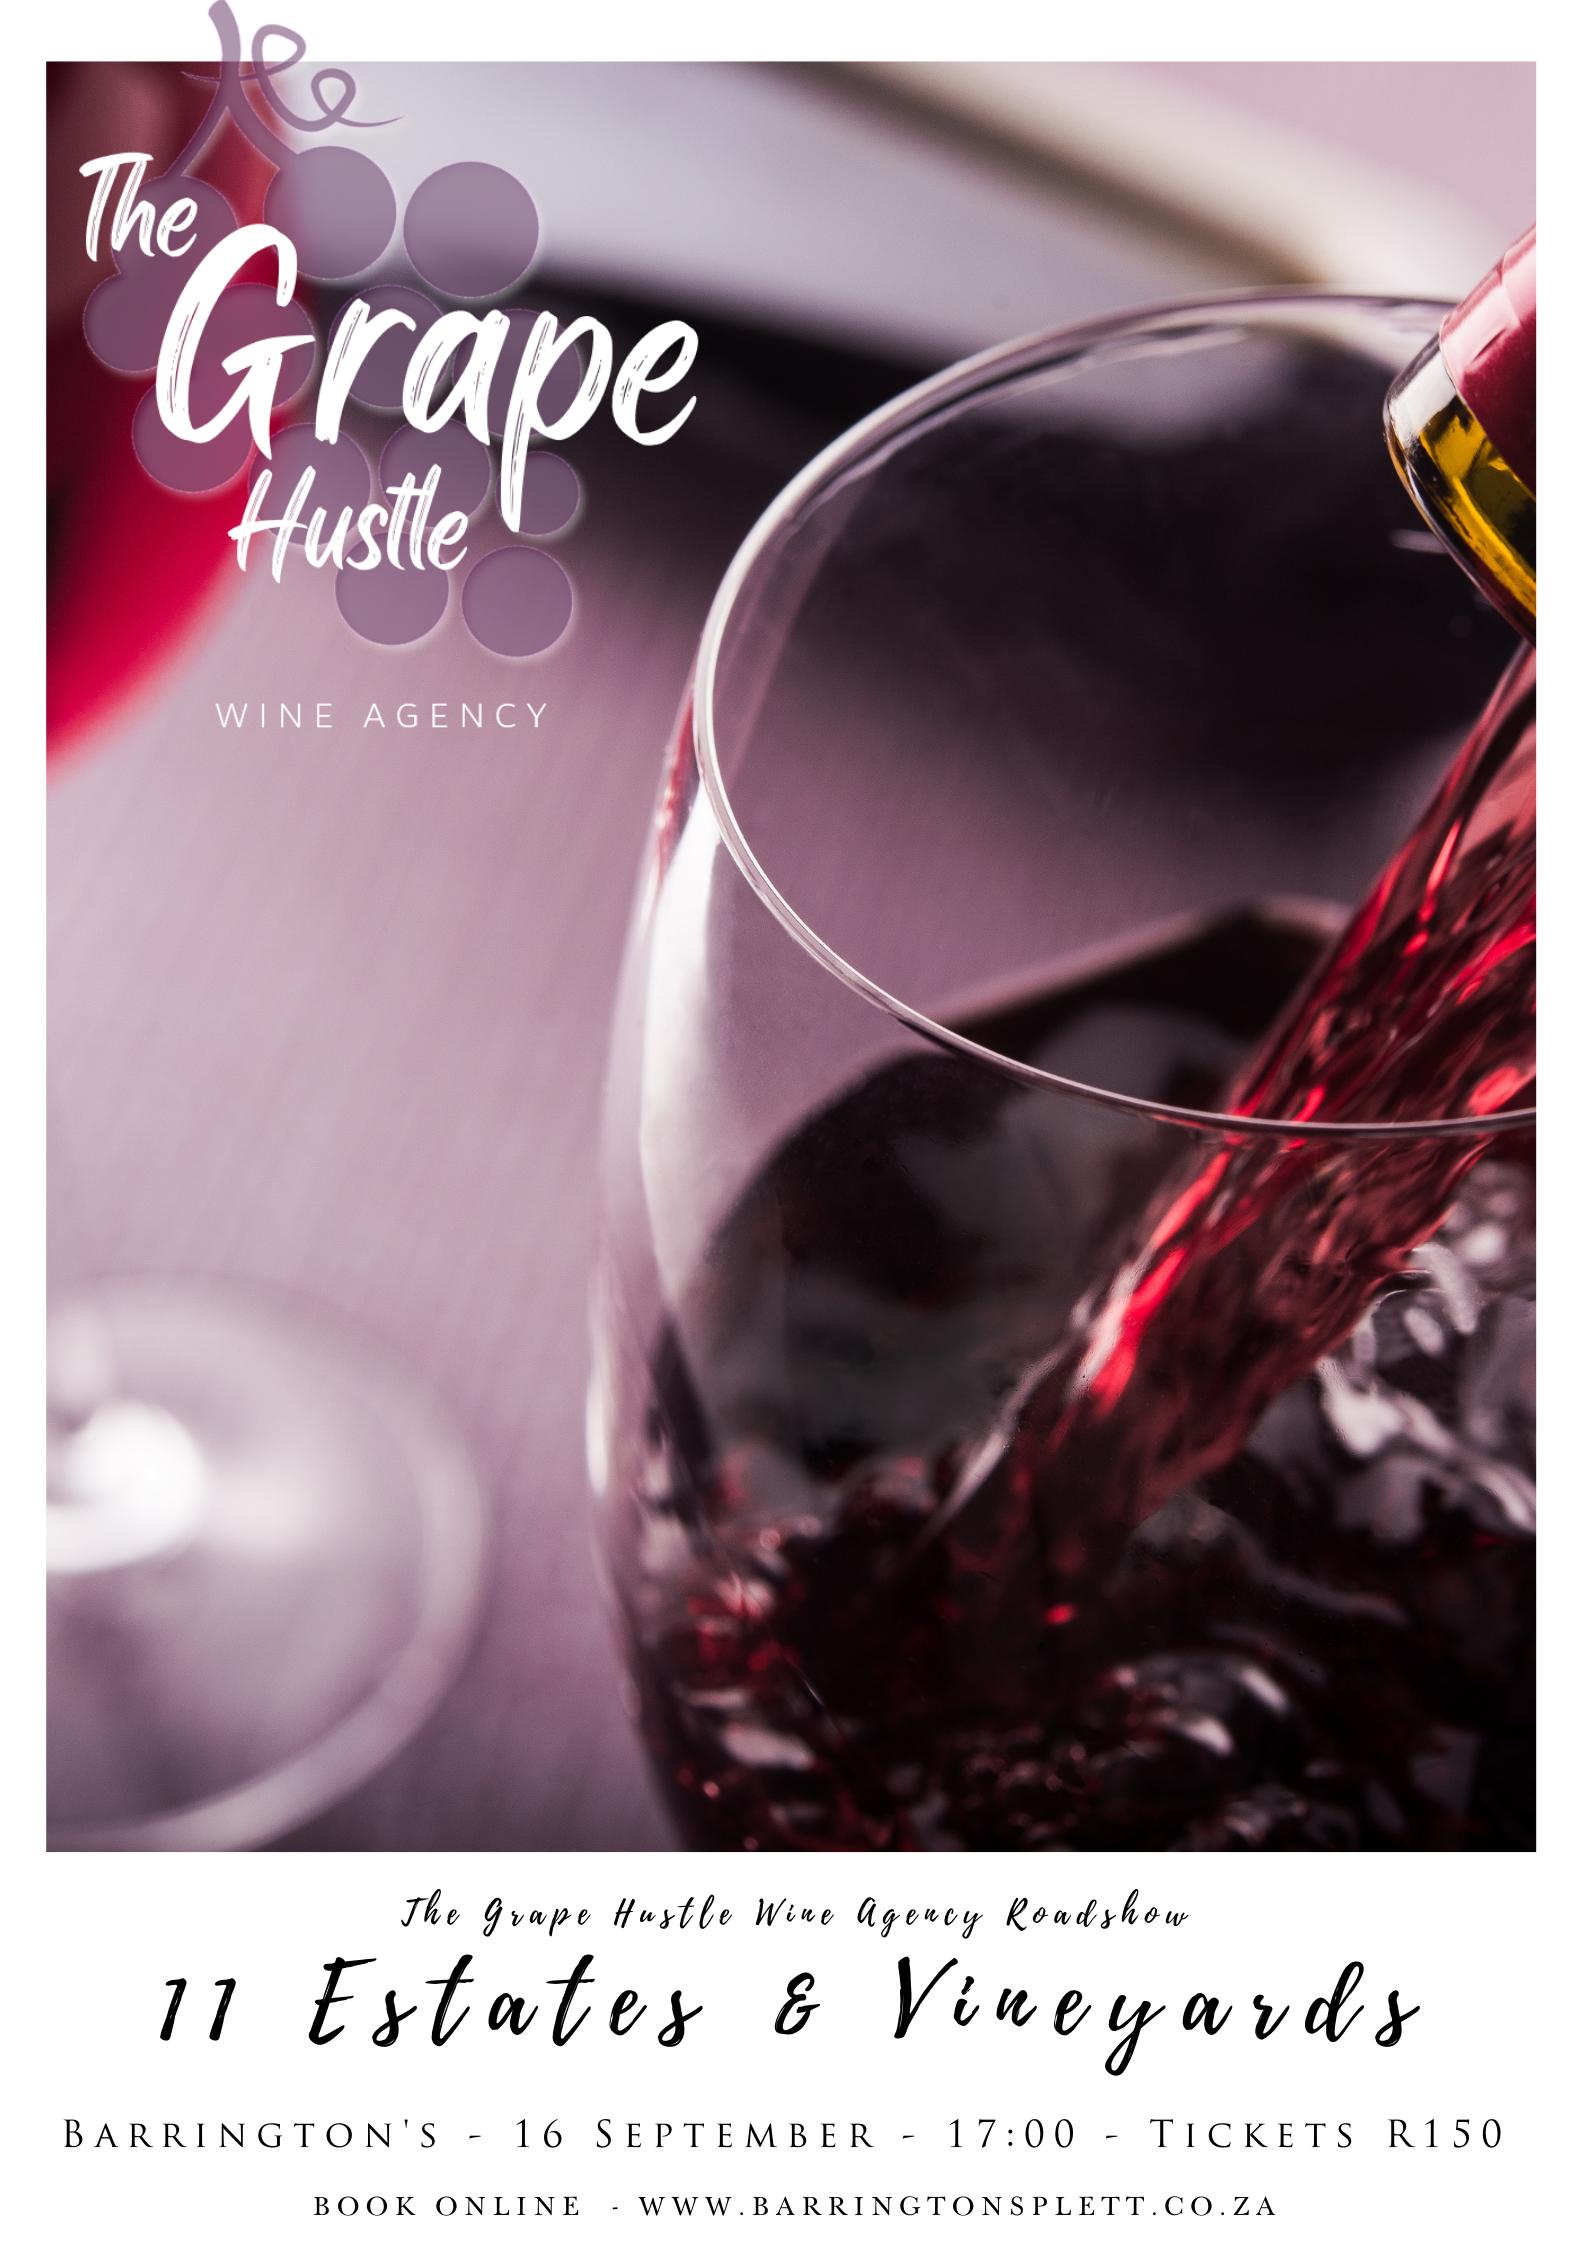 The Grape Hustle